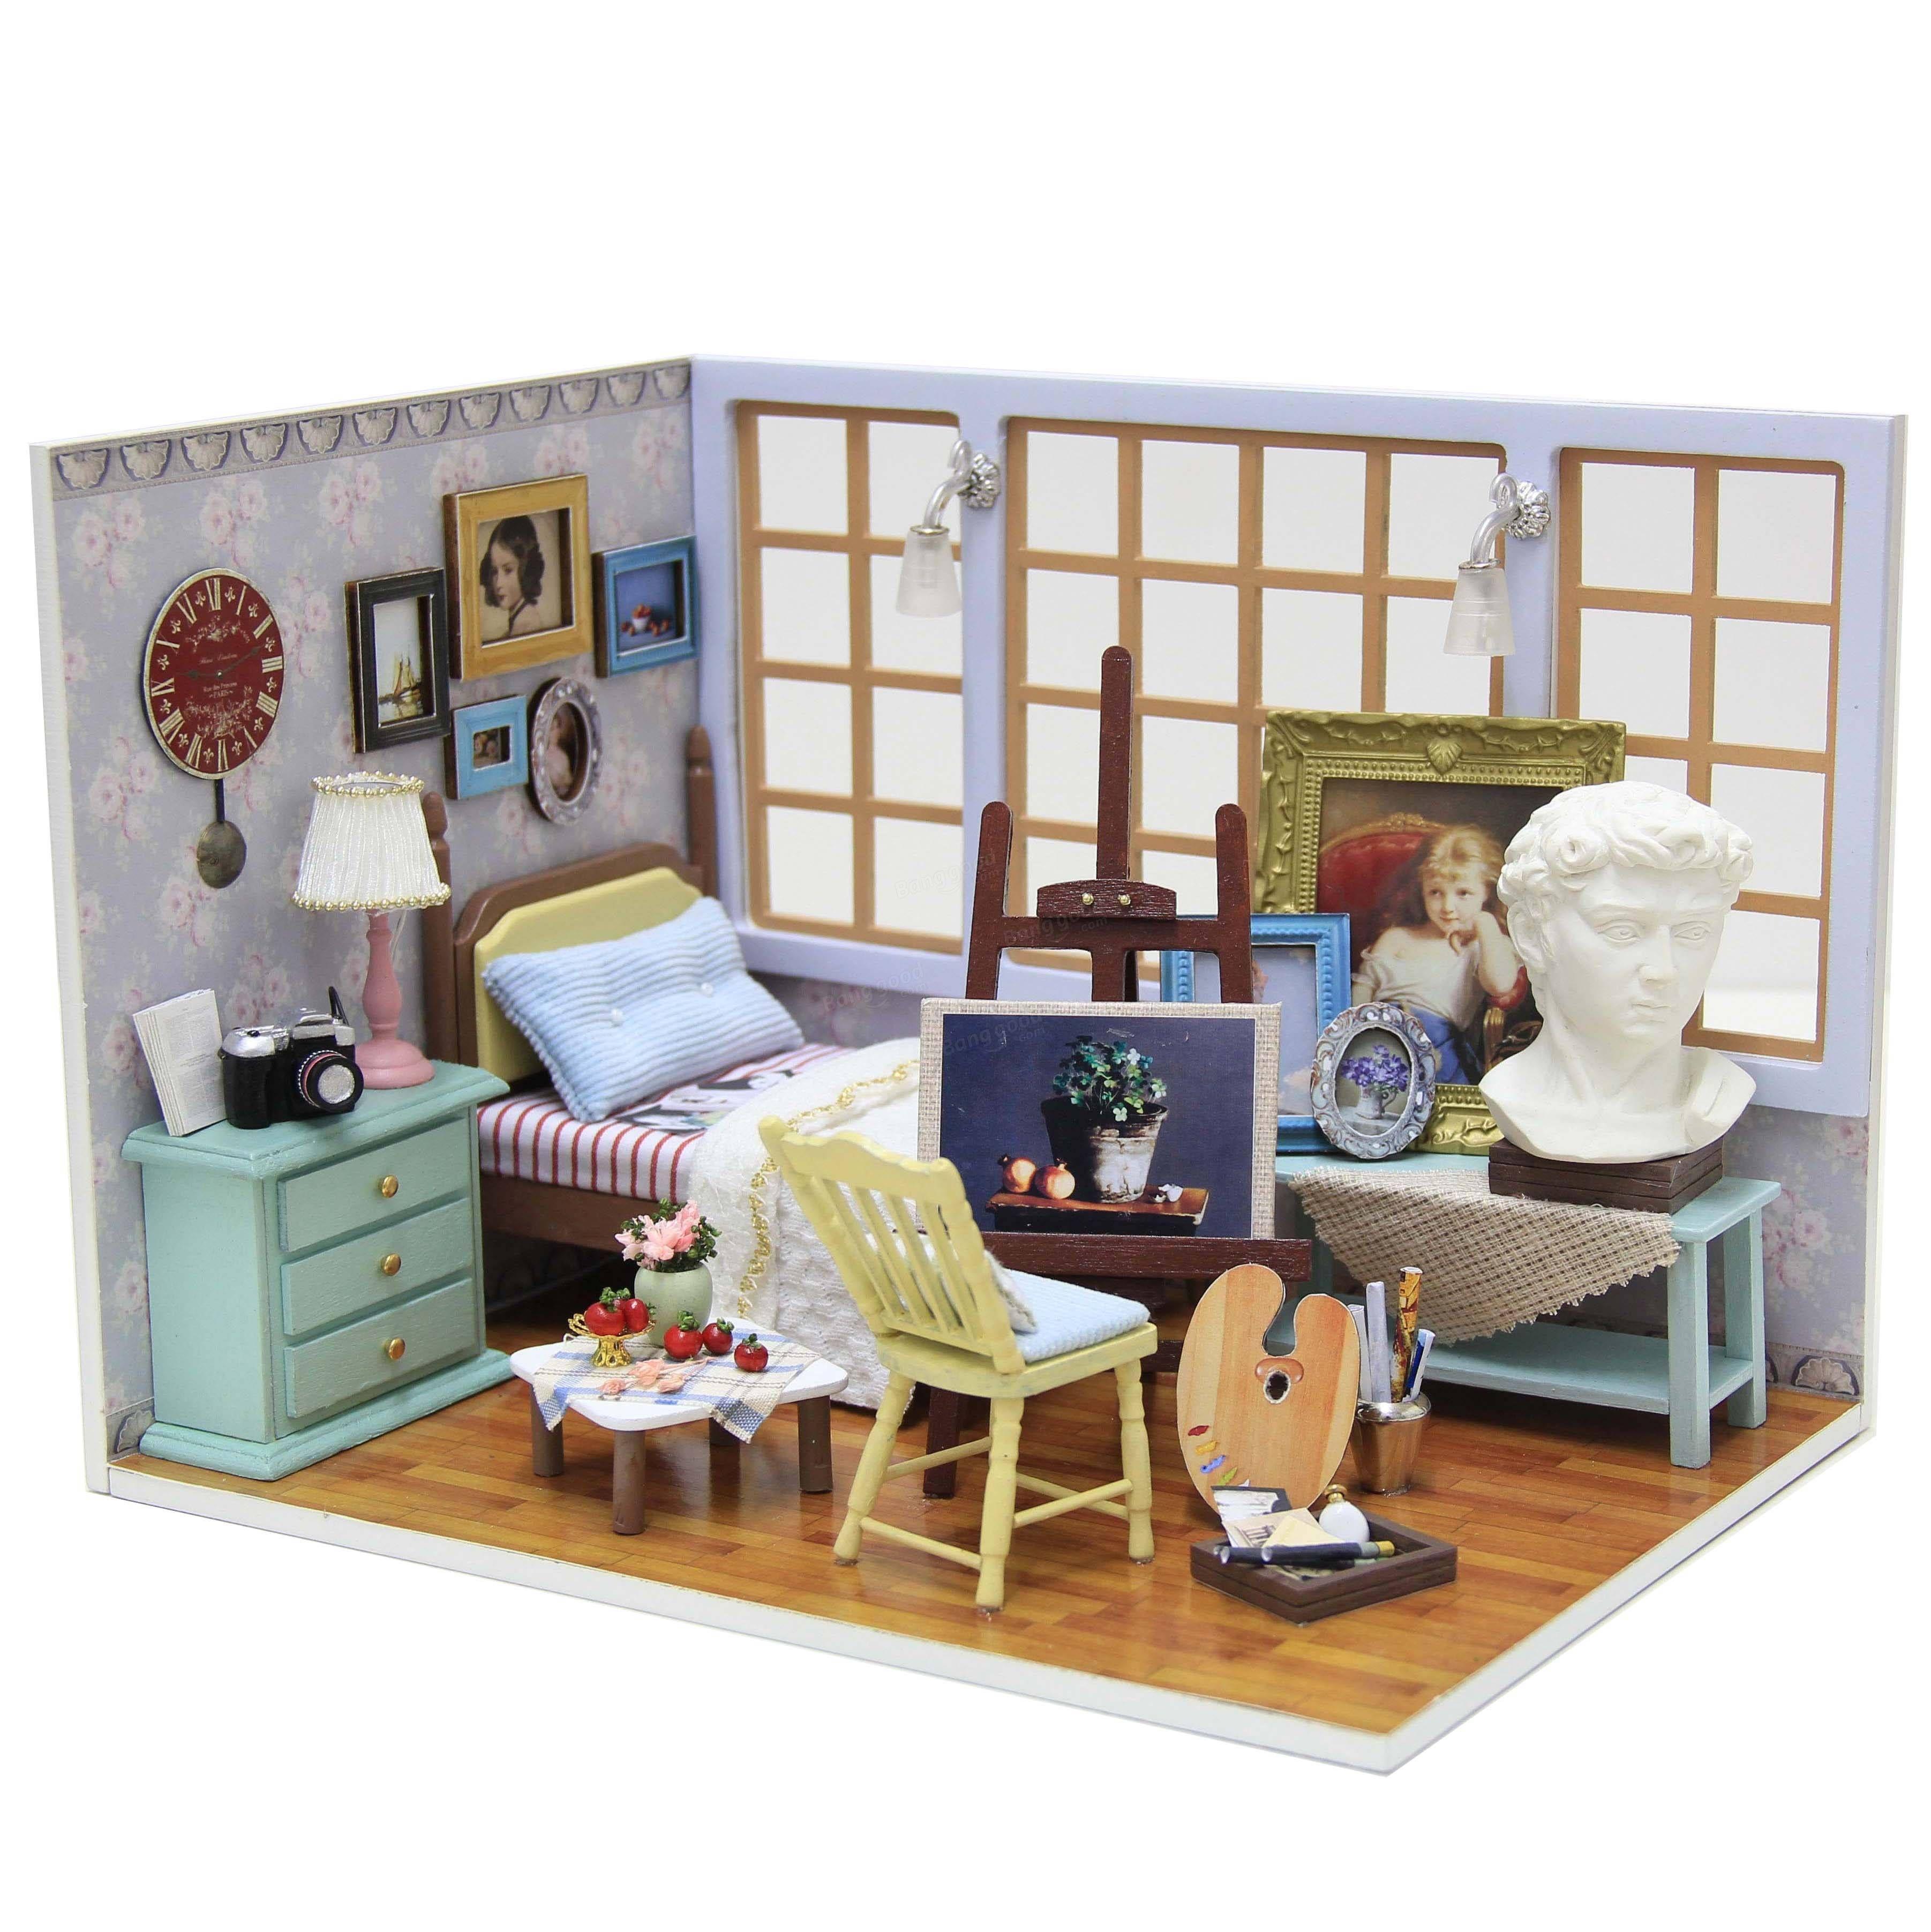 Cuteroom Diy Doll House Miniature Wooden Handmade Model Building ...